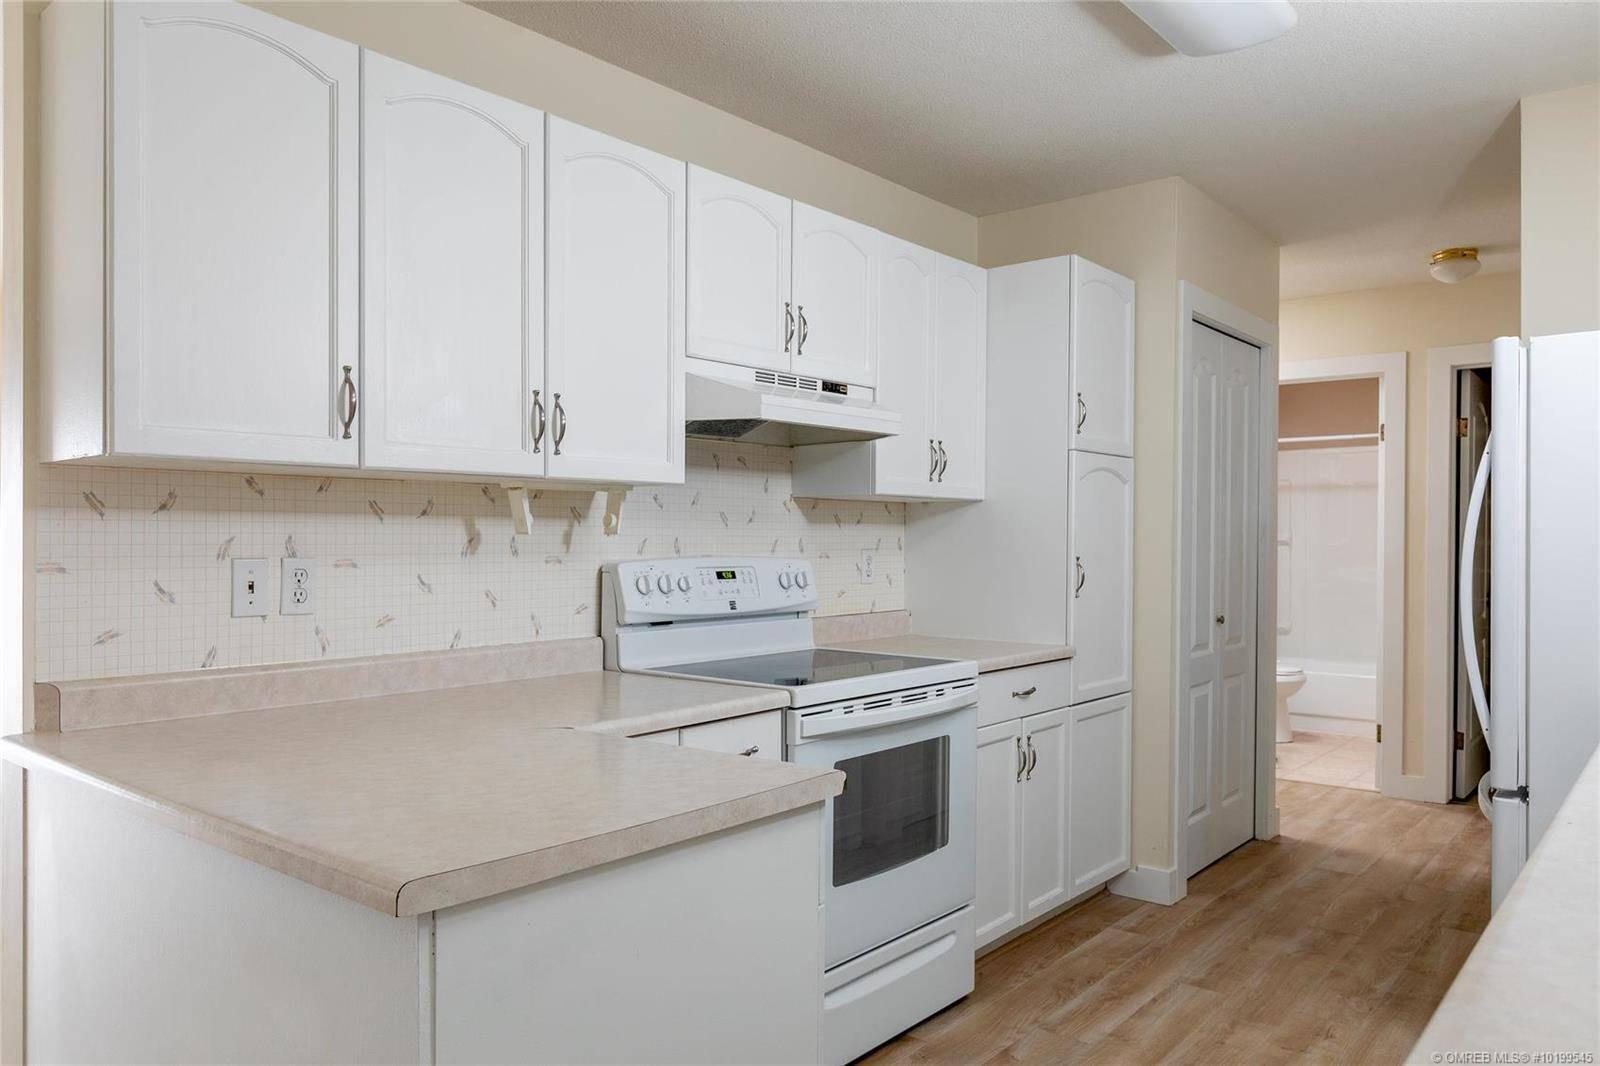 Condo for sale at 769 Klo Rd Unit 414 Kelowna British Columbia - MLS: 10199545